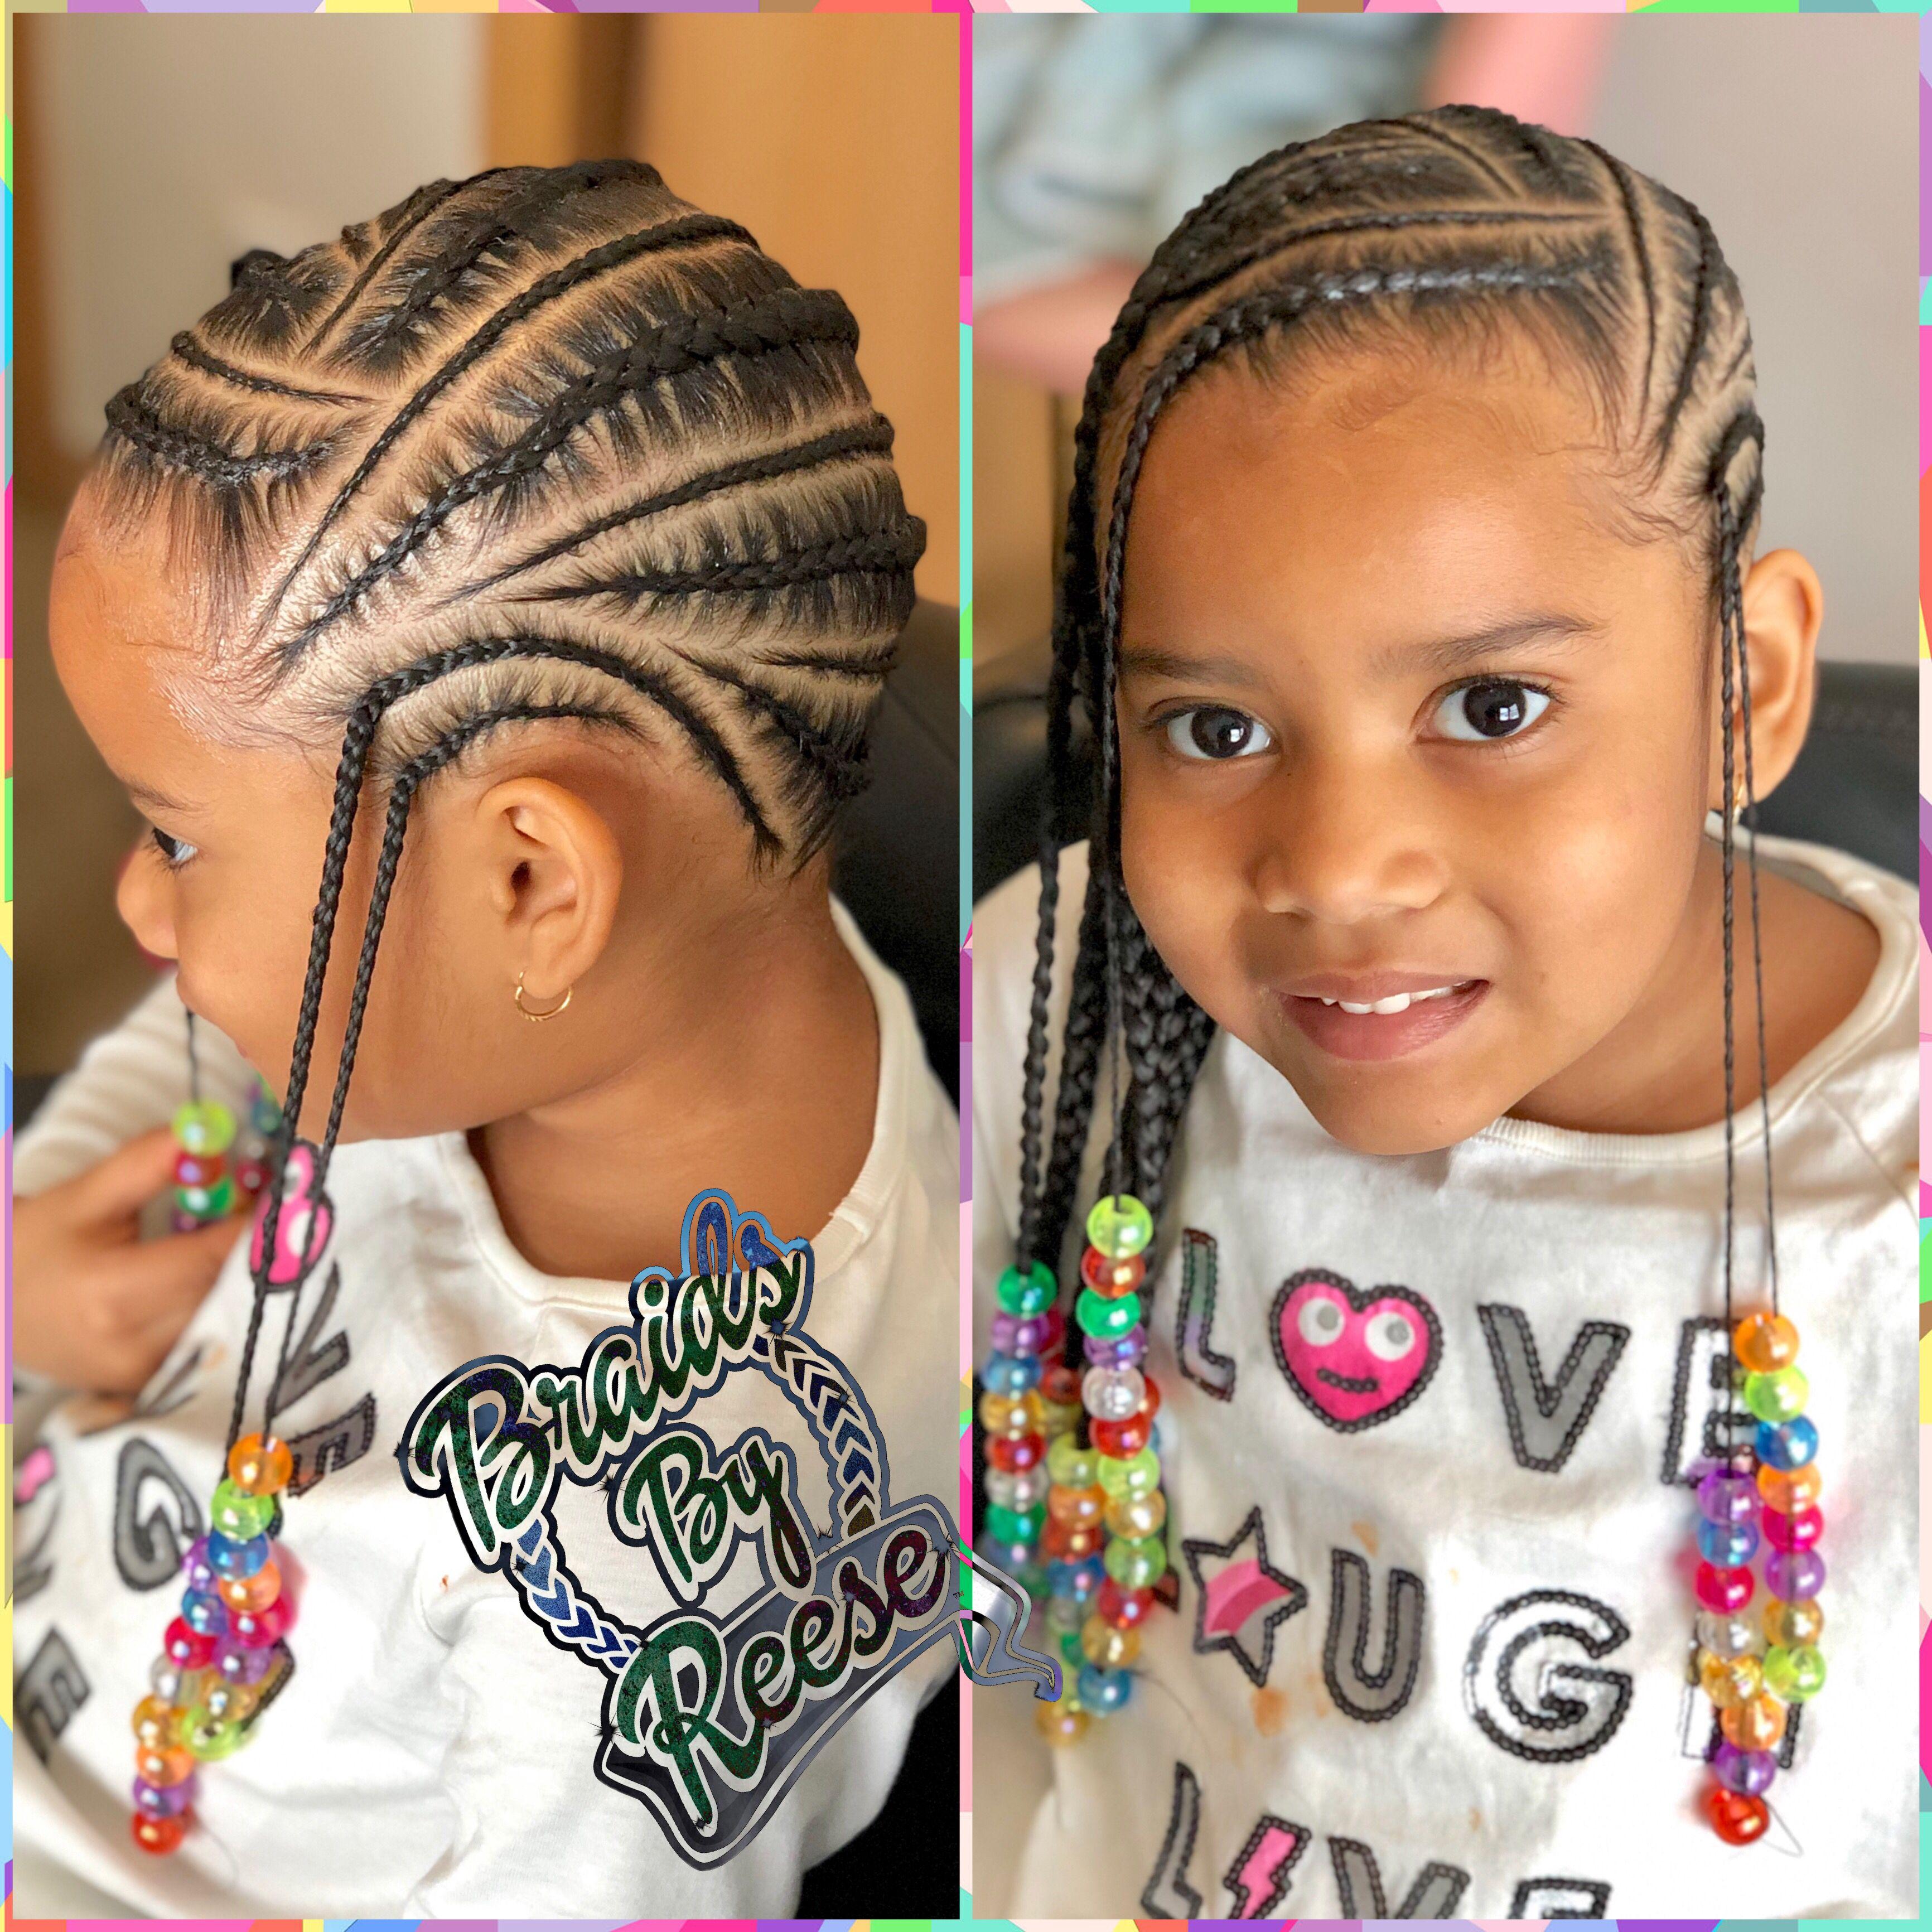 Pin By Braidsbyreese On Hair Hair Styles Black Kids Hairstyles Braids For Black Hair